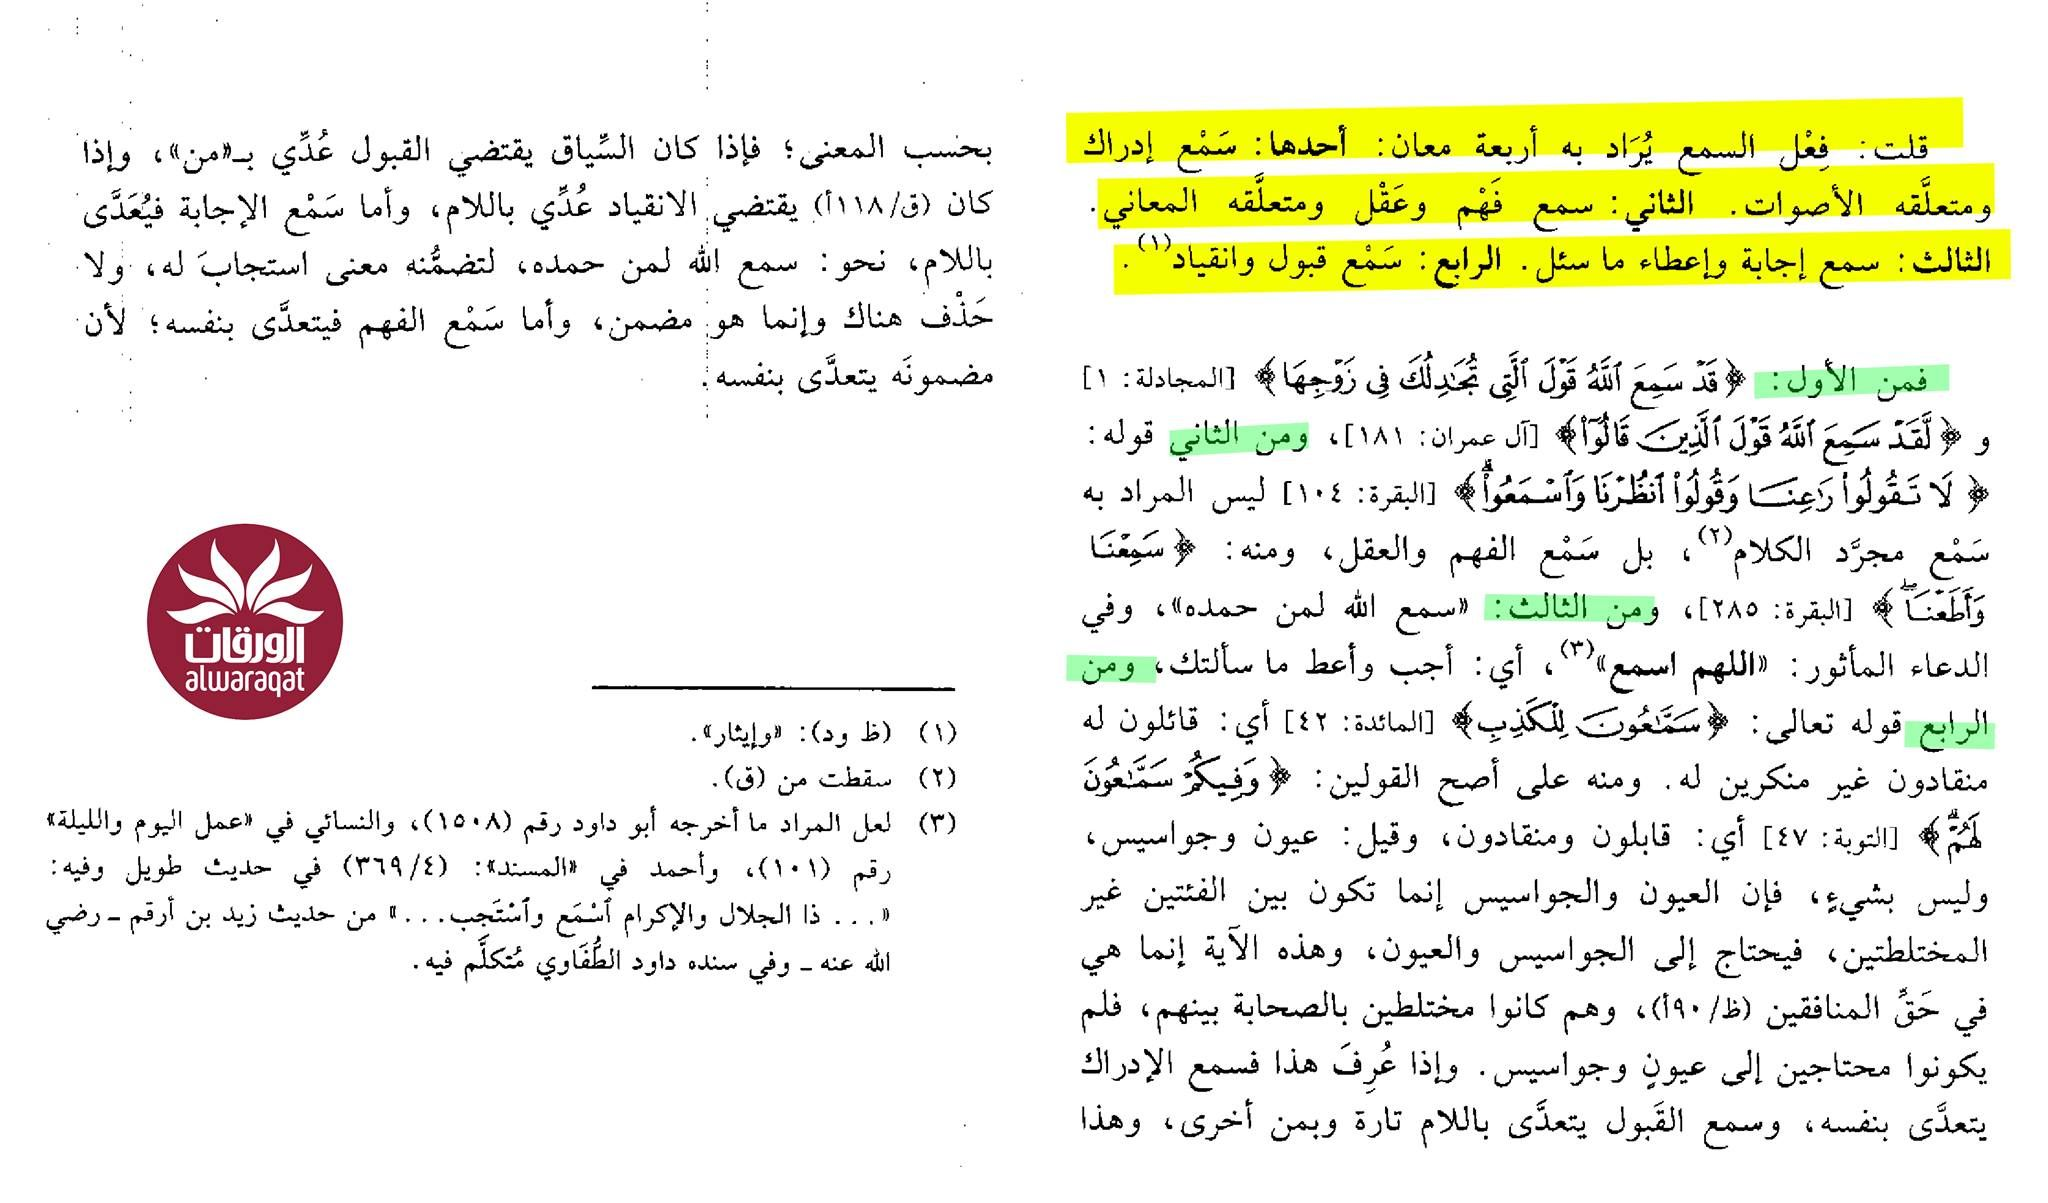 Ibn Alqayyem5 Words Word Search Puzzle